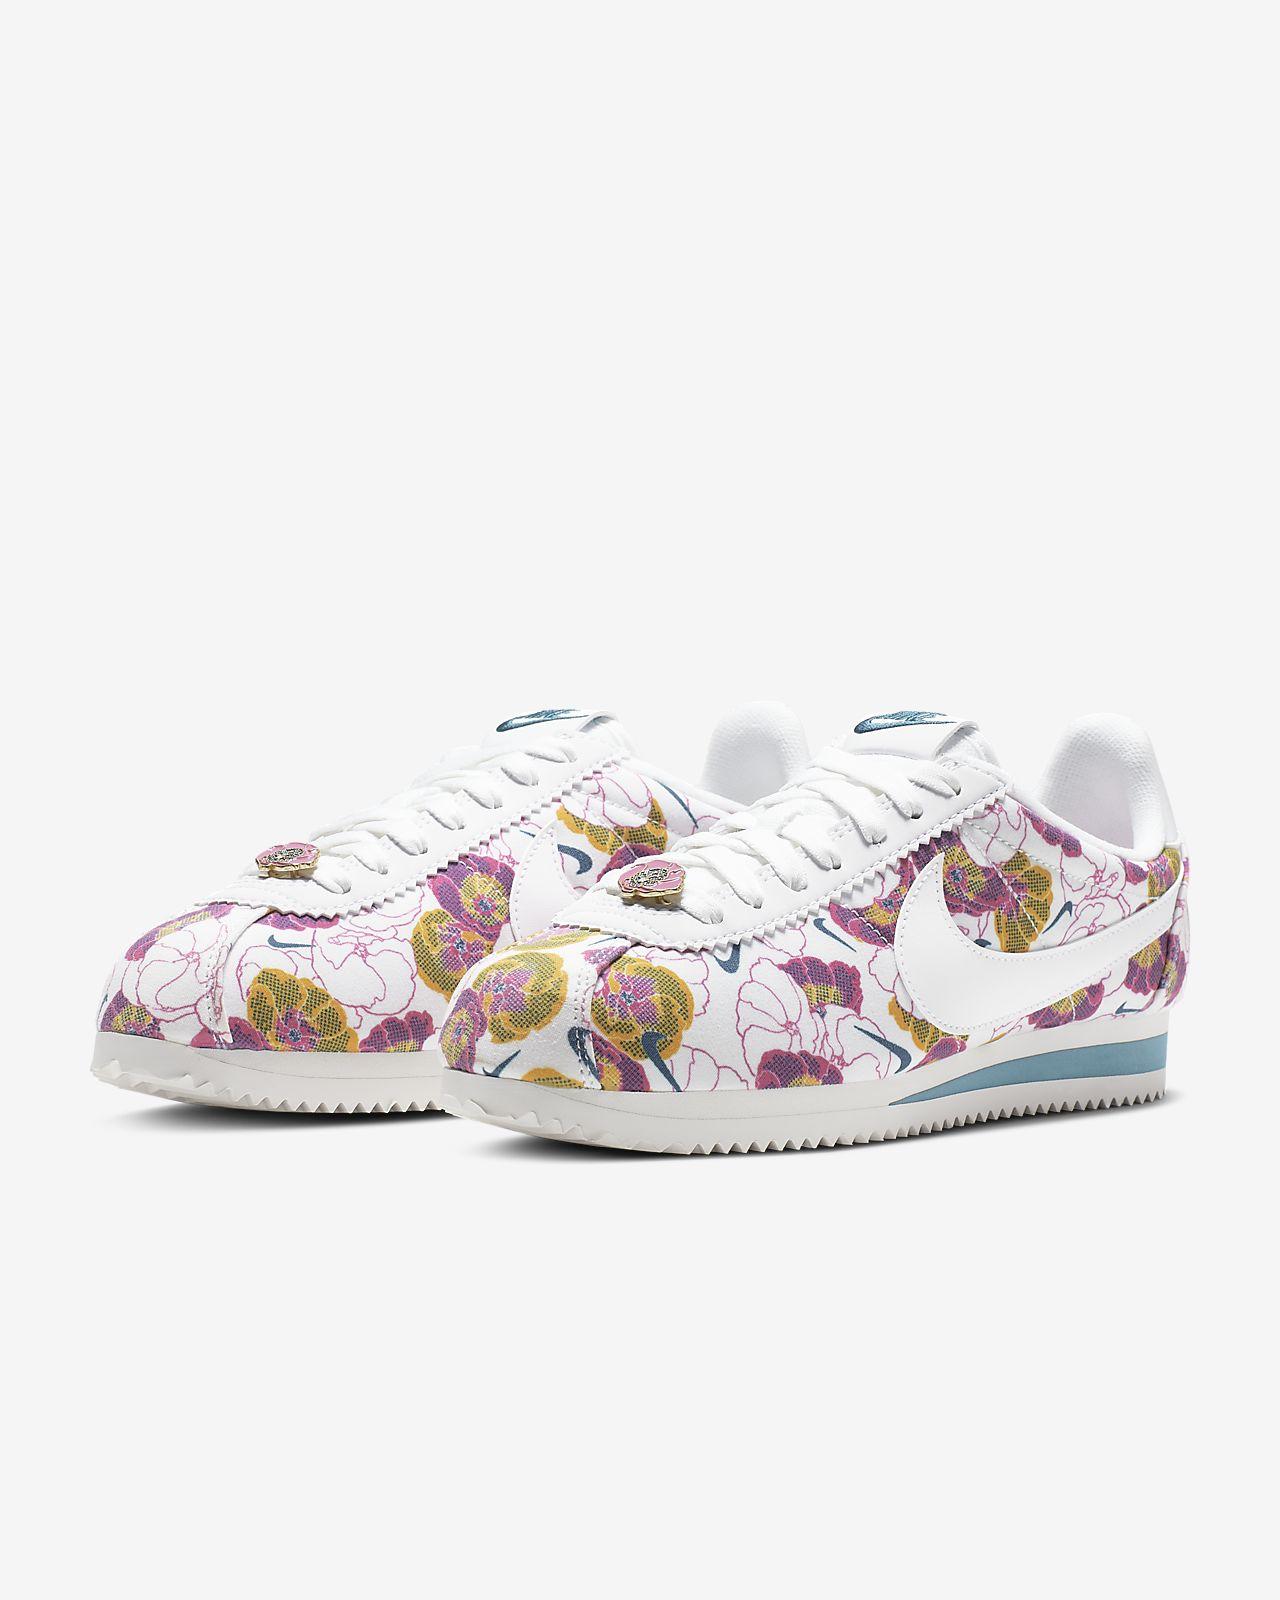 32c46689b4c32 Nike Classic Cortez LX Floral Women's Shoe. Nike.com